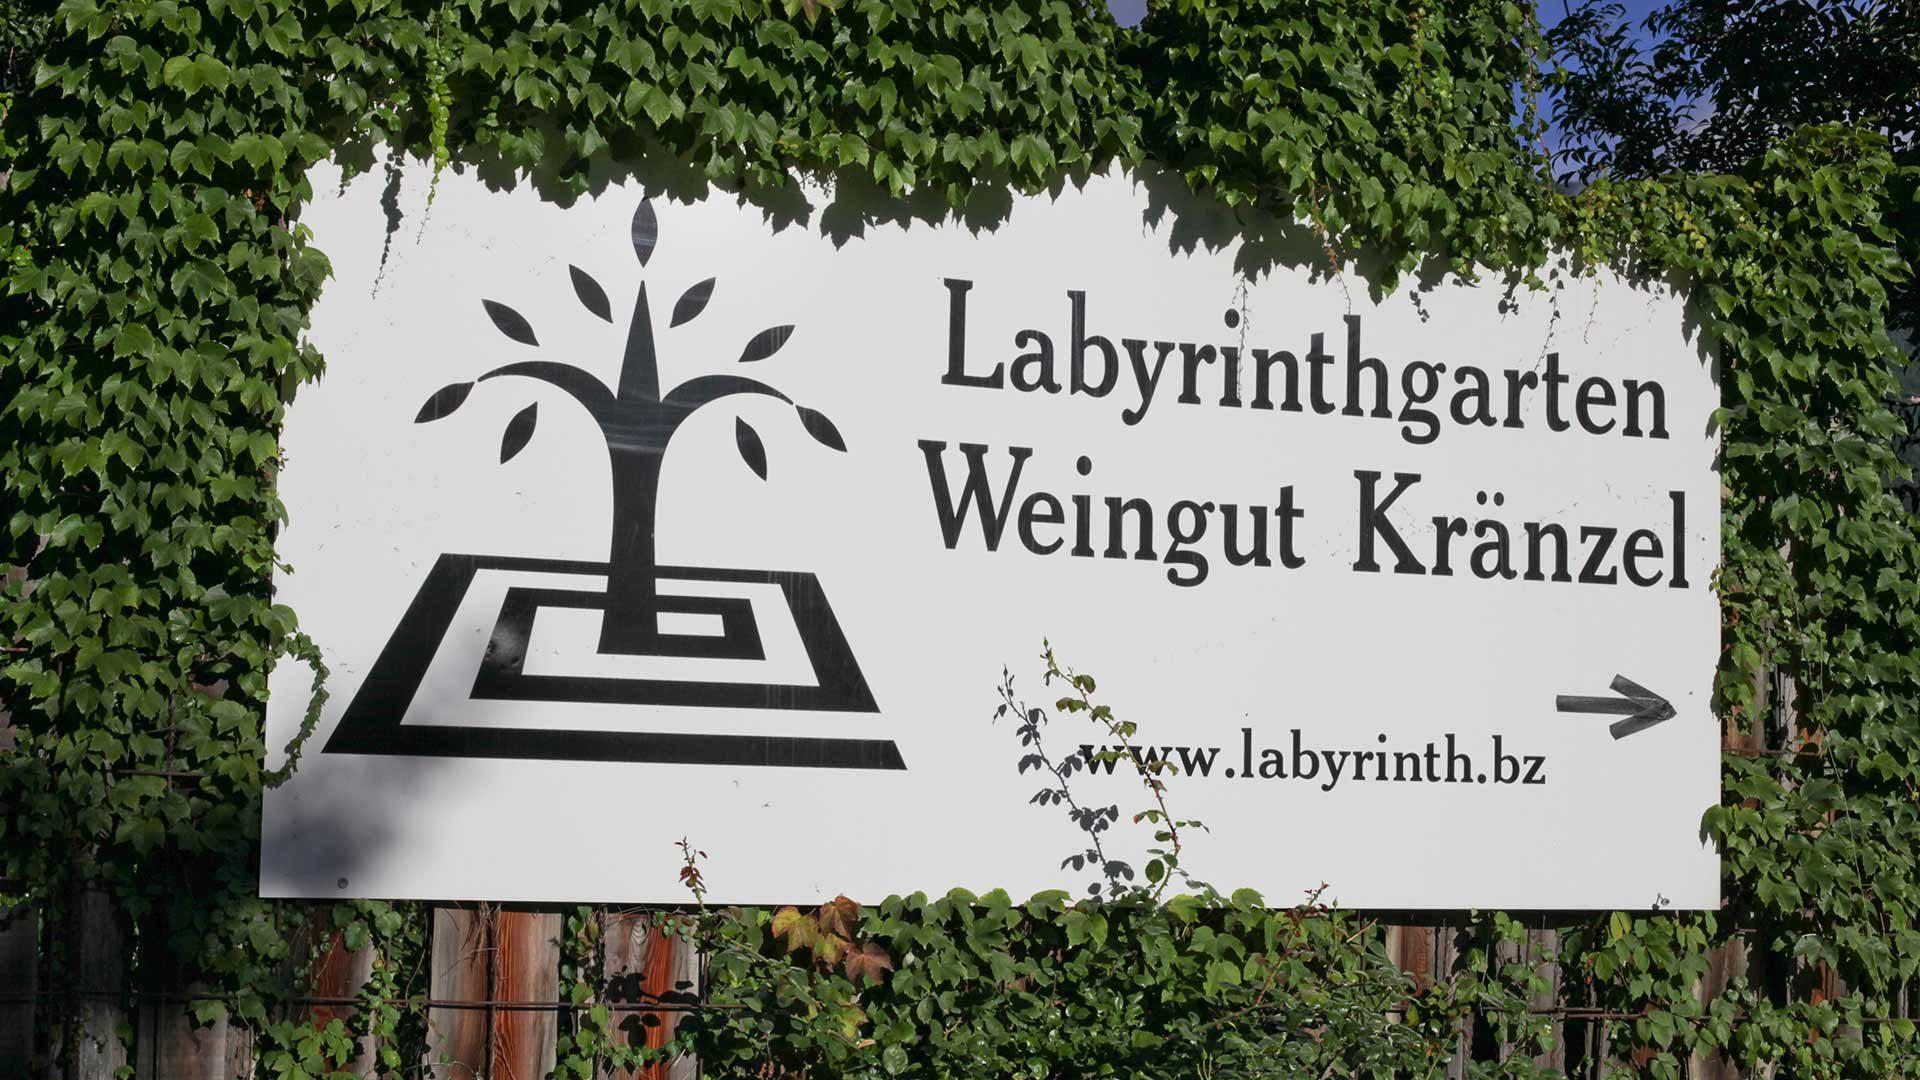 Azienda vinicola - Kränzelhof